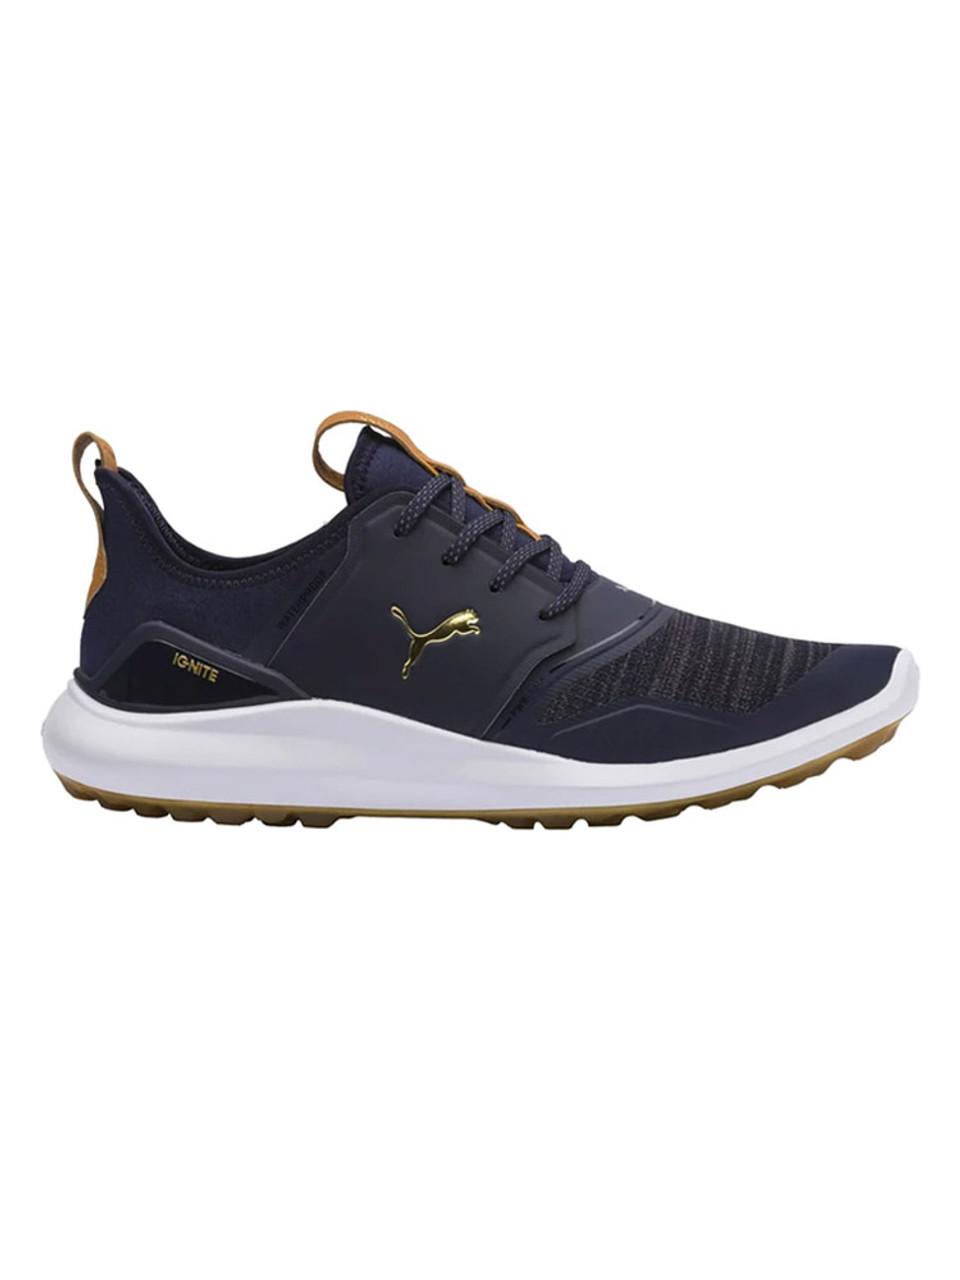 d3ff2ed8d014c8 Puma Ignite NXT Golf Shoes - Peacoat - Mens For Sale | GolfBox